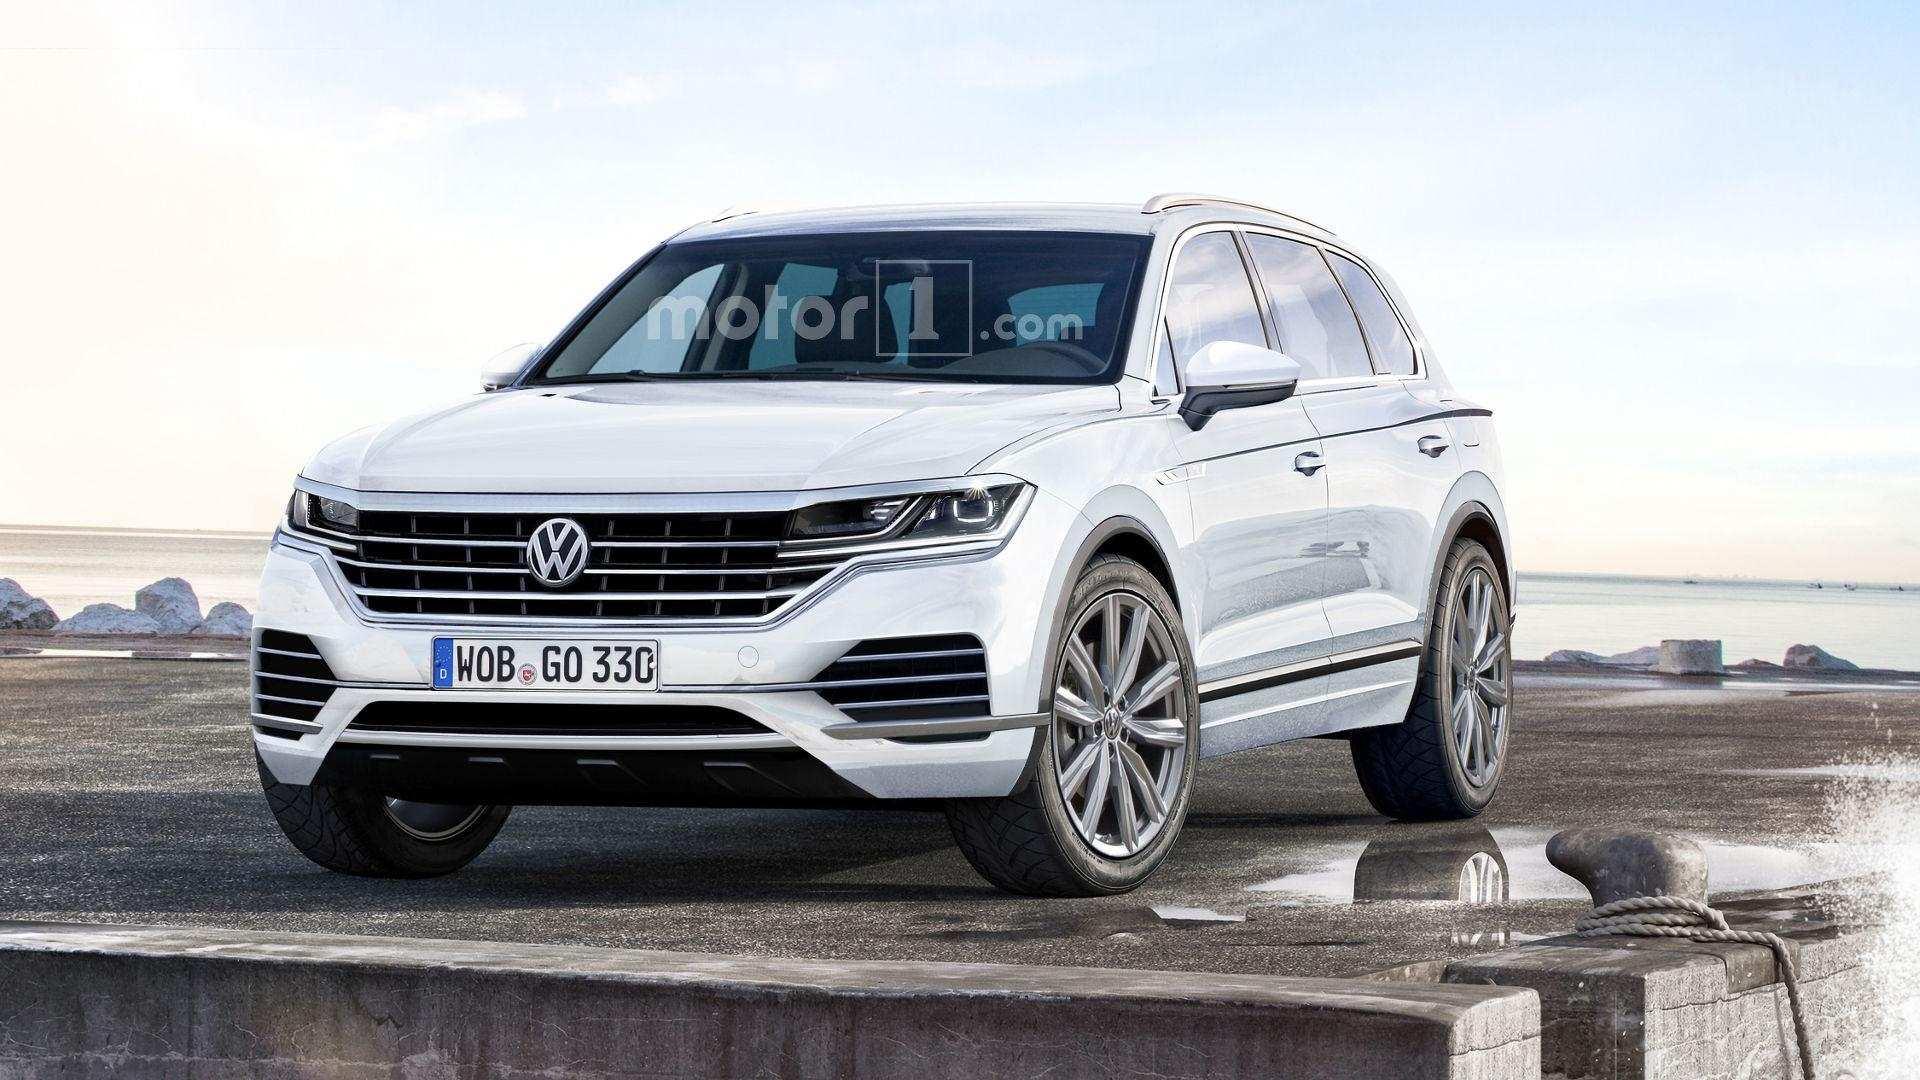 32 New VW Touareg 2020 History by VW Touareg 2020